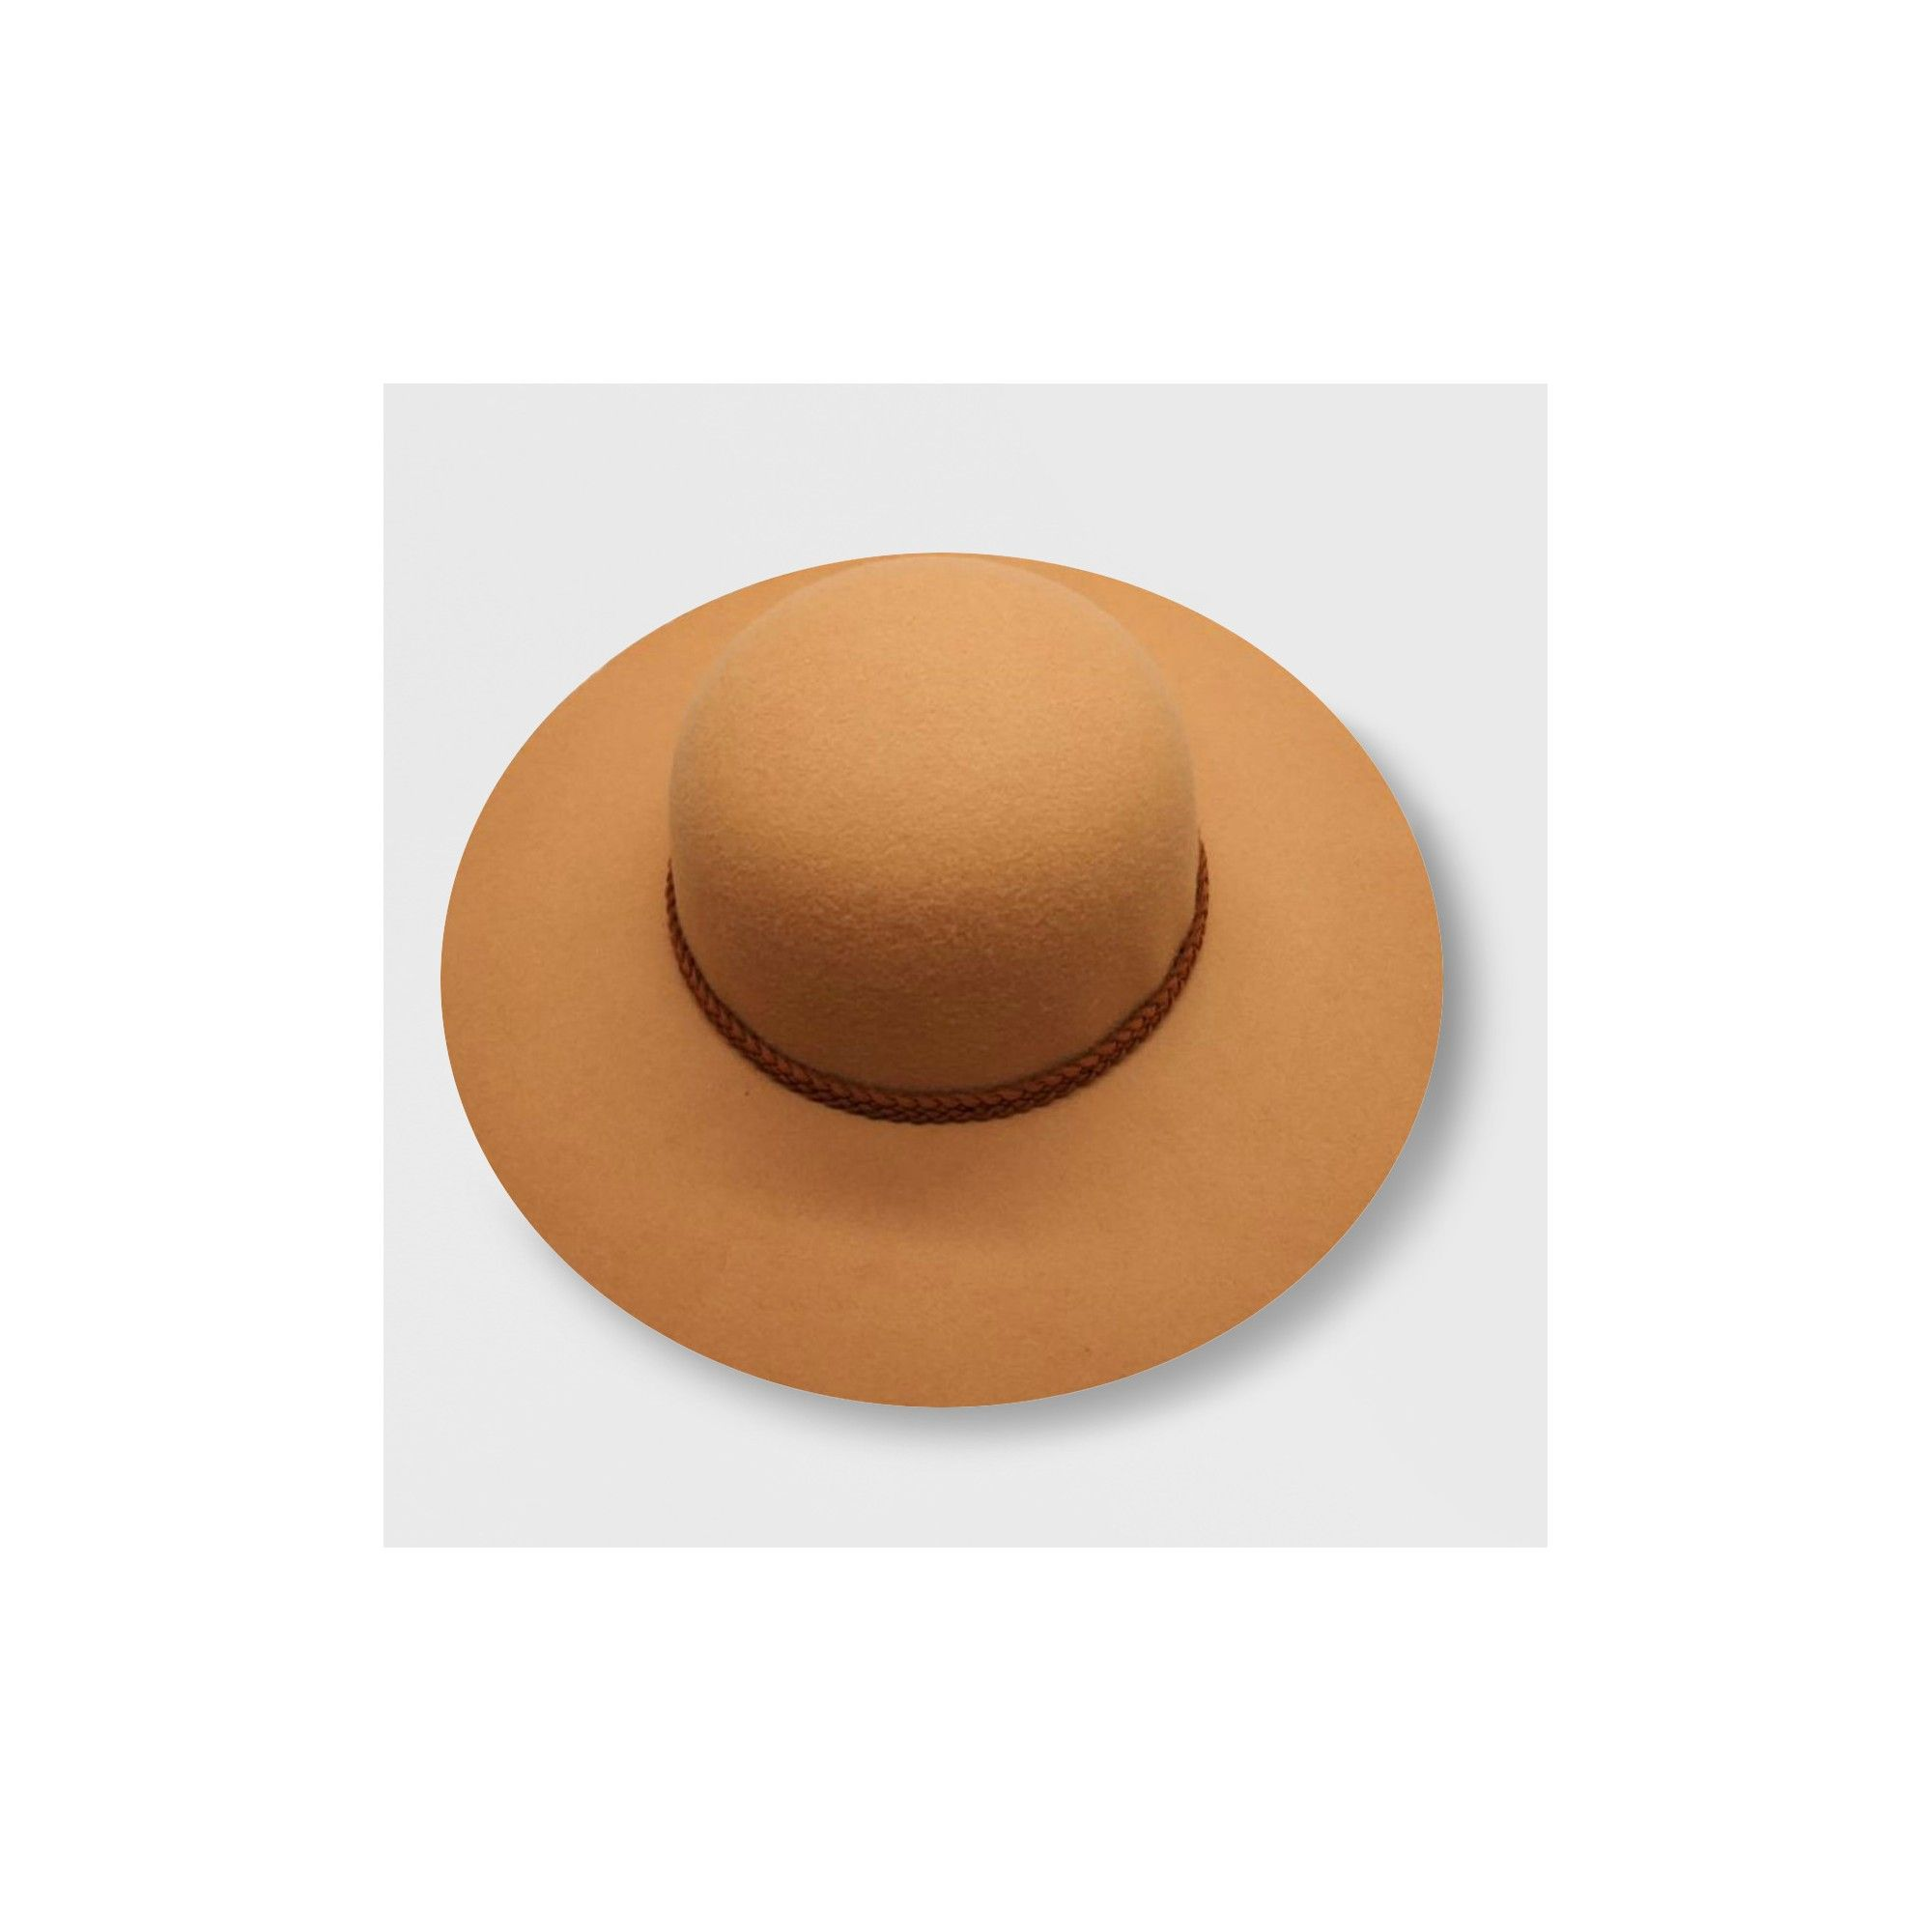 fd93187a685501 Genuine Kids from OshKosh Toddler Girls' Faux Felt Floppy Hat - Tan 2T-5T